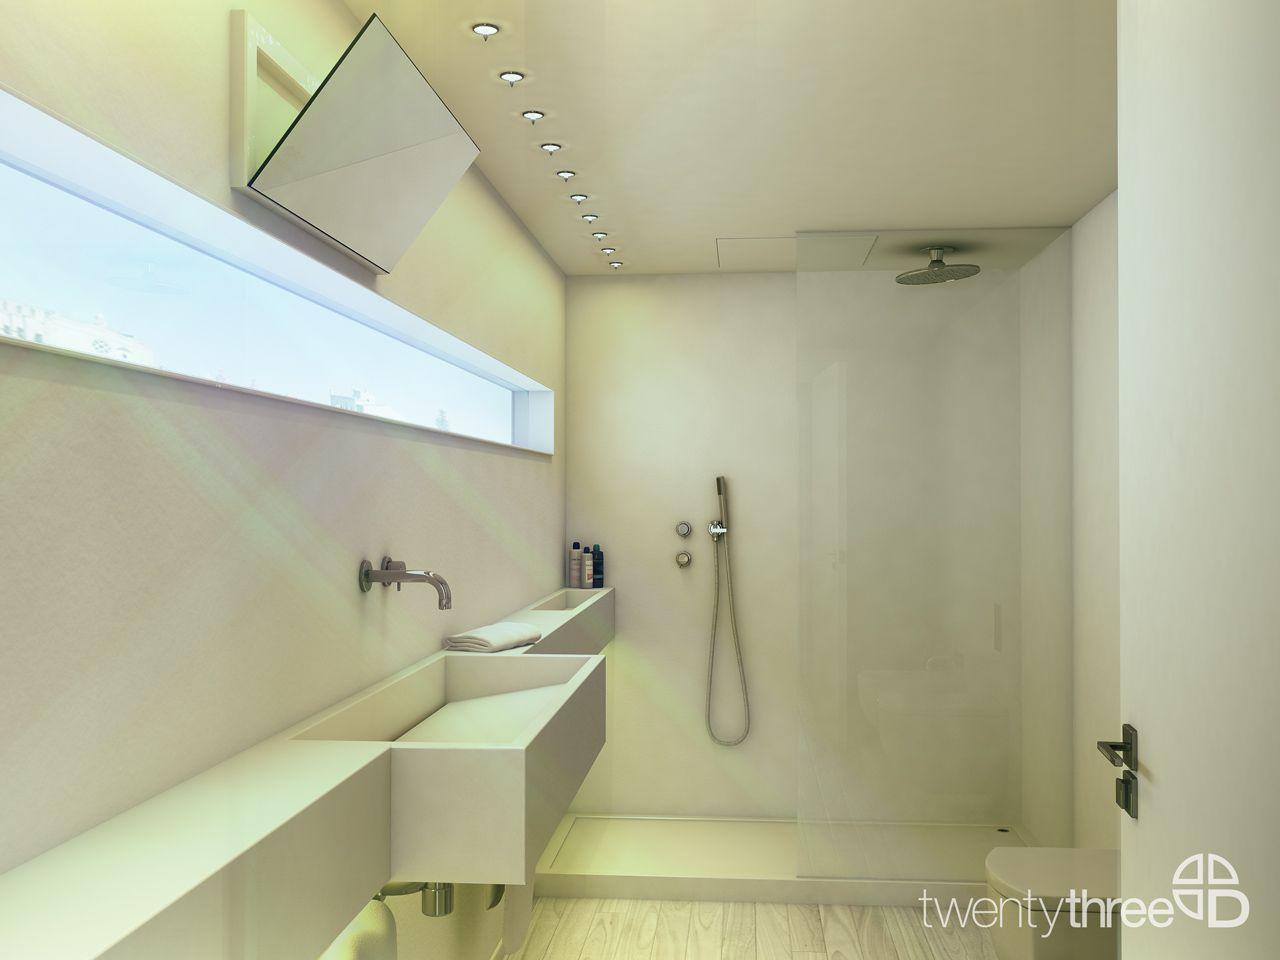 Architectural Visualization by TwentyThreeD Creative Studio. Apartamento en Mahon (Spain) MODO Architecture. Vista baño.